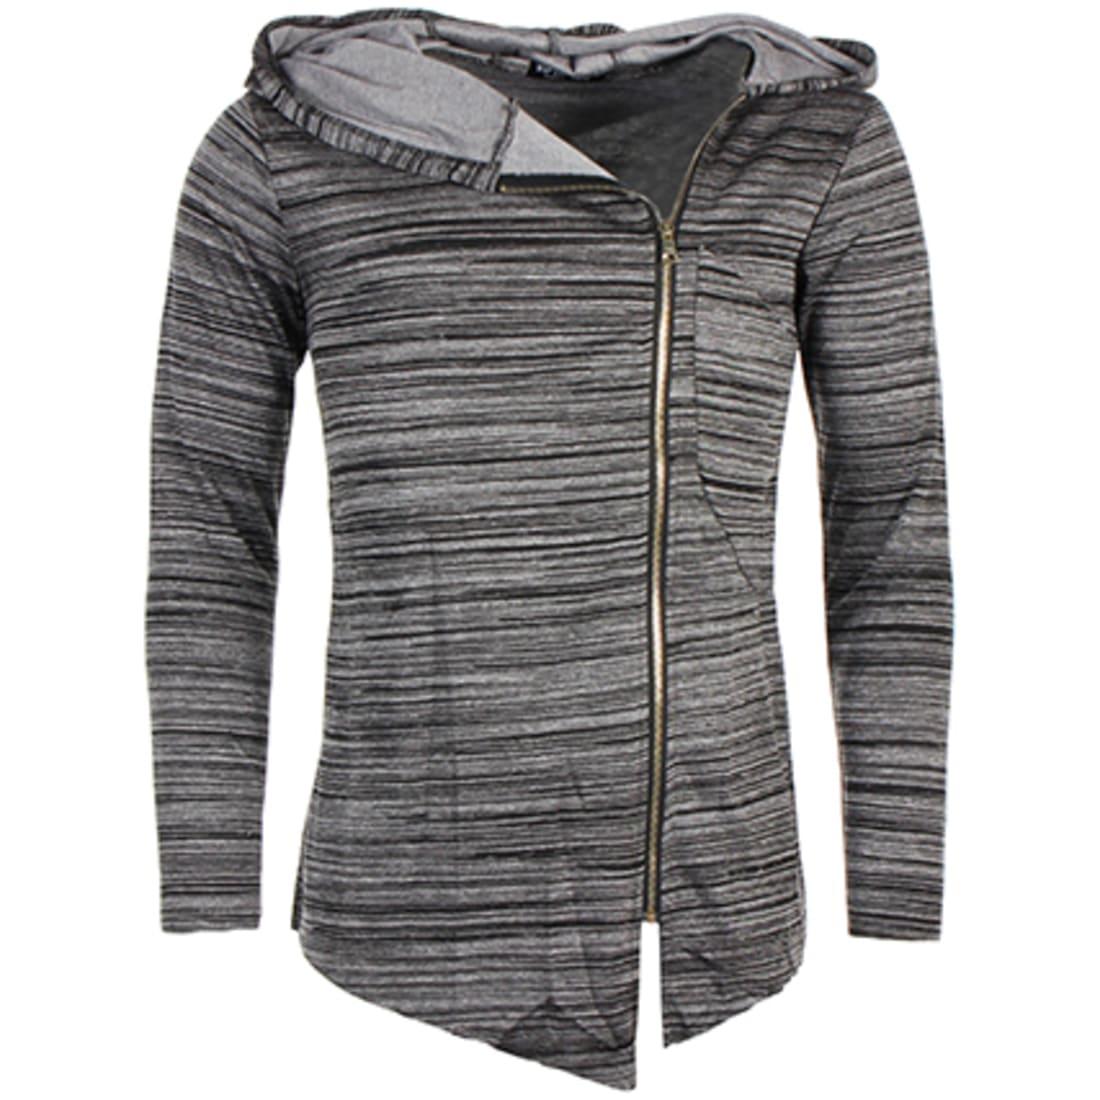 VIP Clothing Veste Zippée Capuche Oversize 066 Noir Zebra